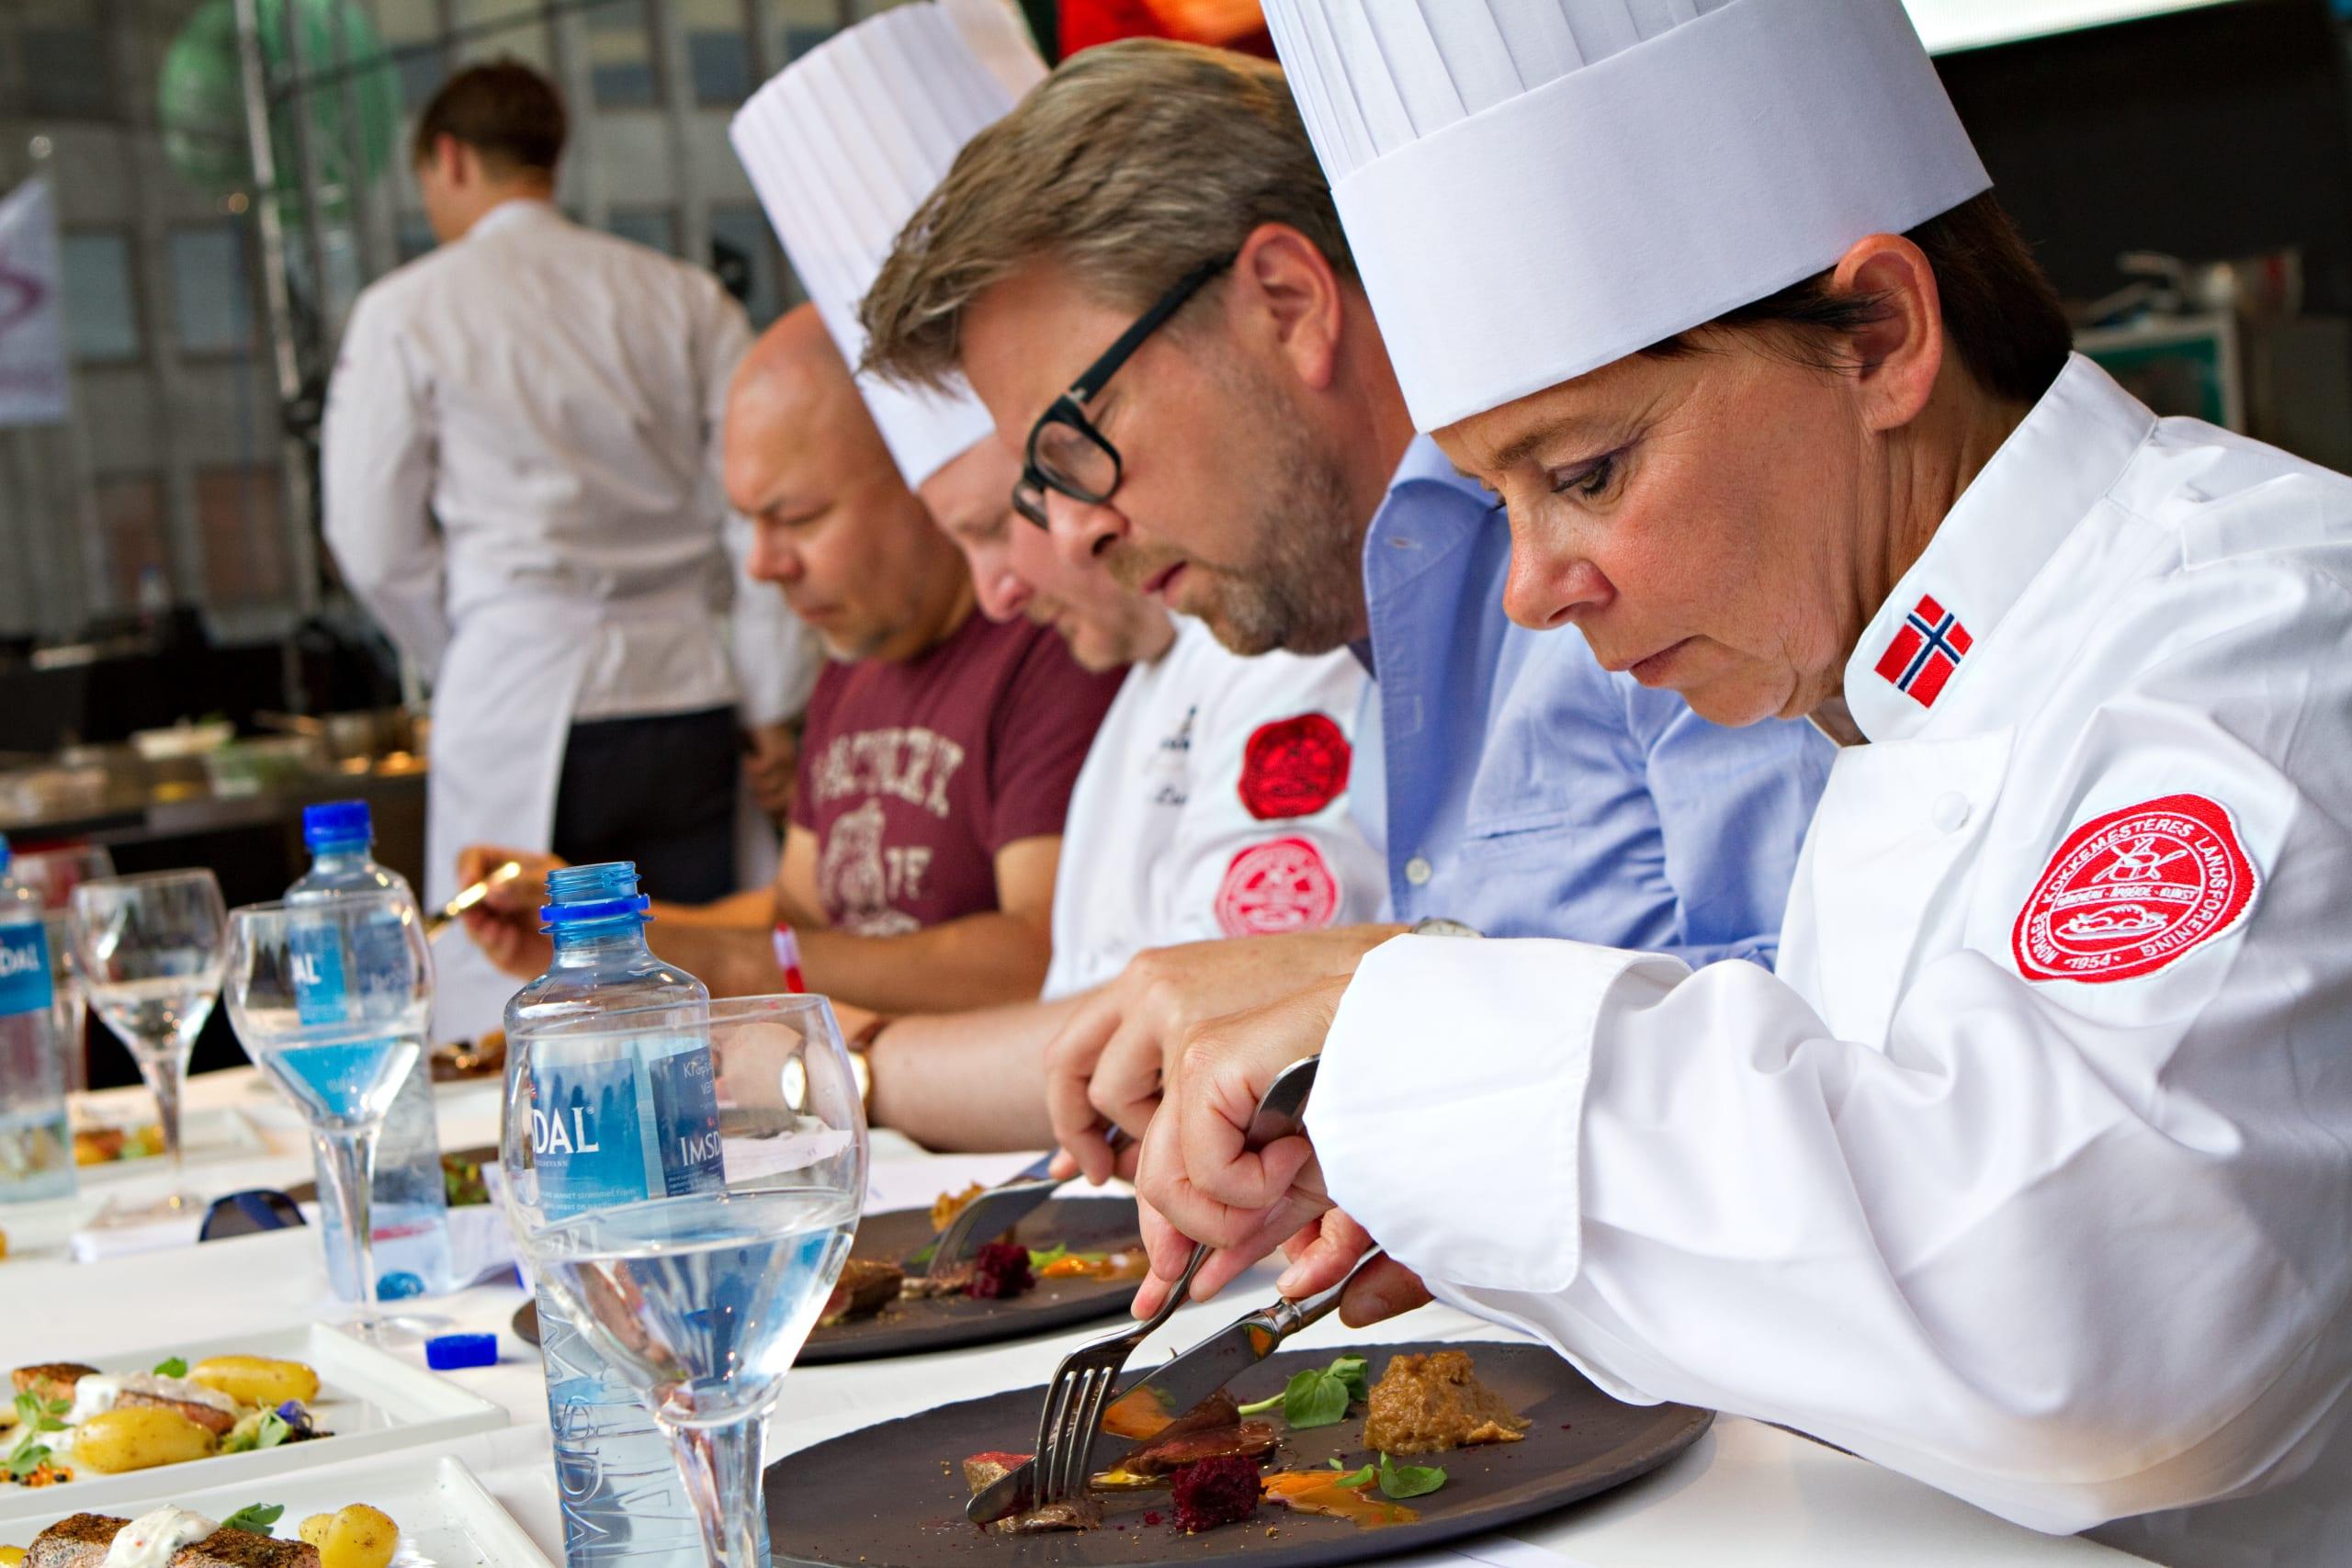 Chefs judge food at Gladmat festival in Stavanger